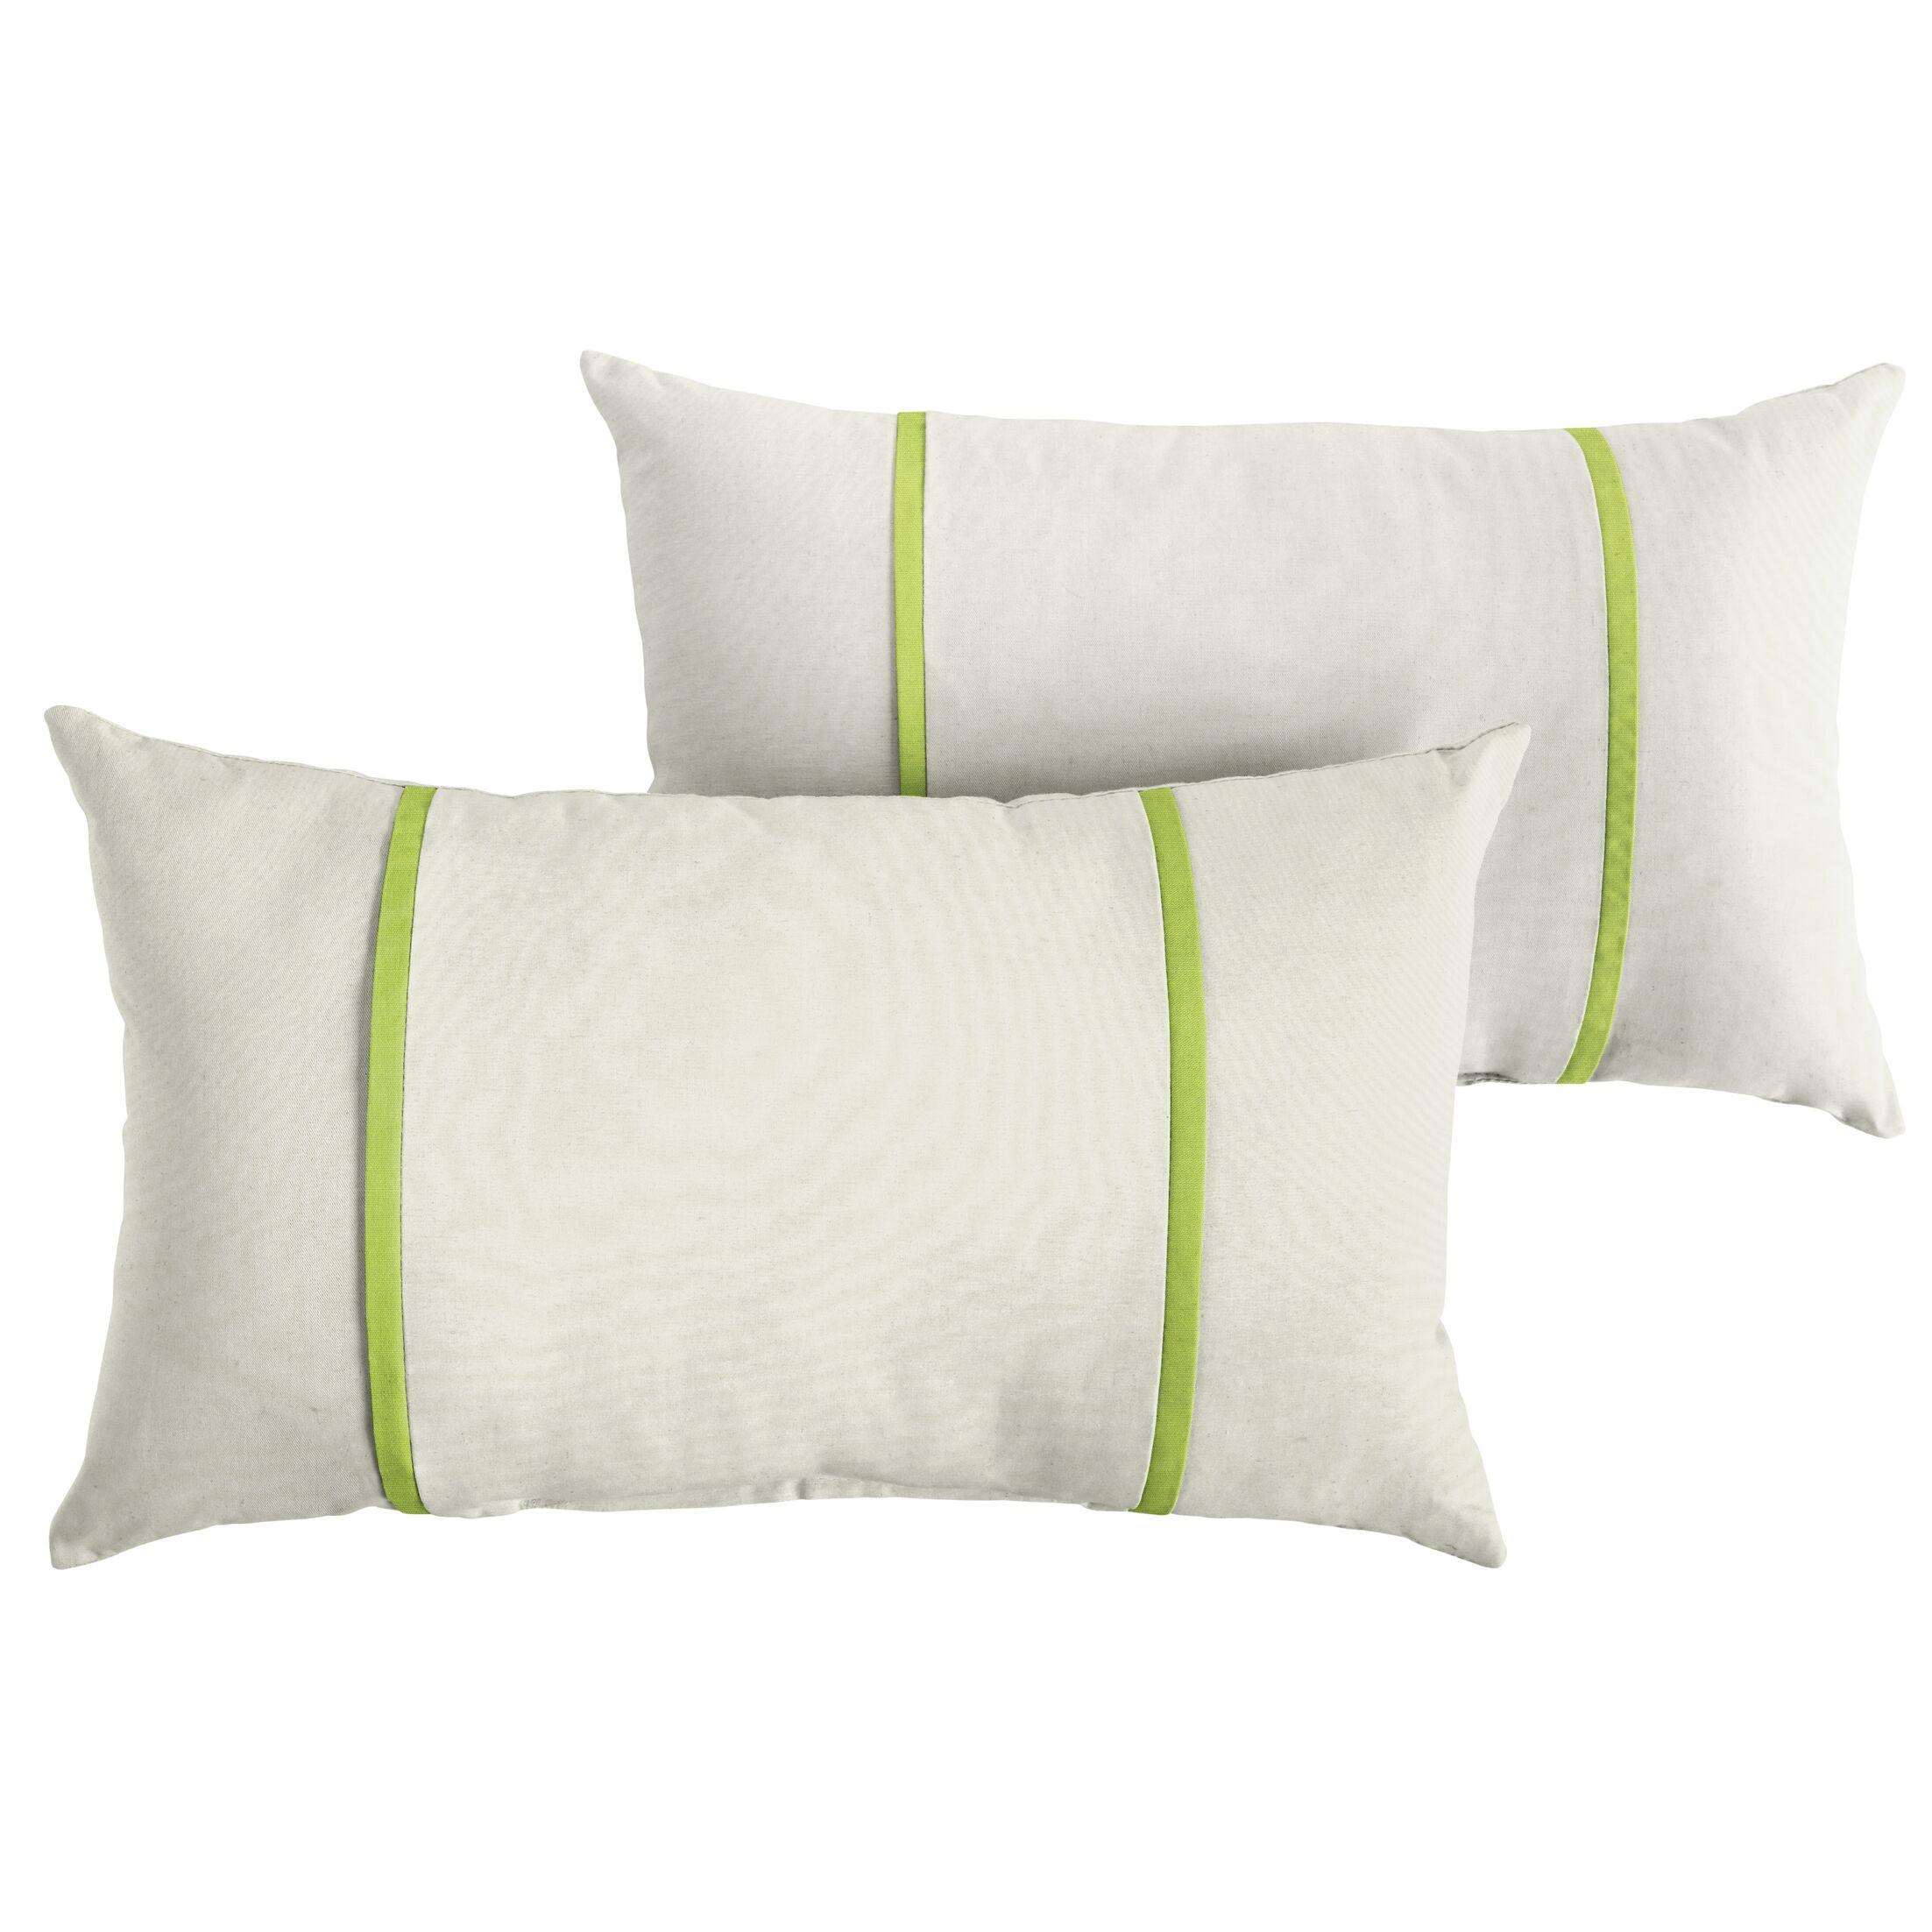 Churchton Indoor/Outdoor Sunbrella Lumbar Pillow Color: White/Macaw